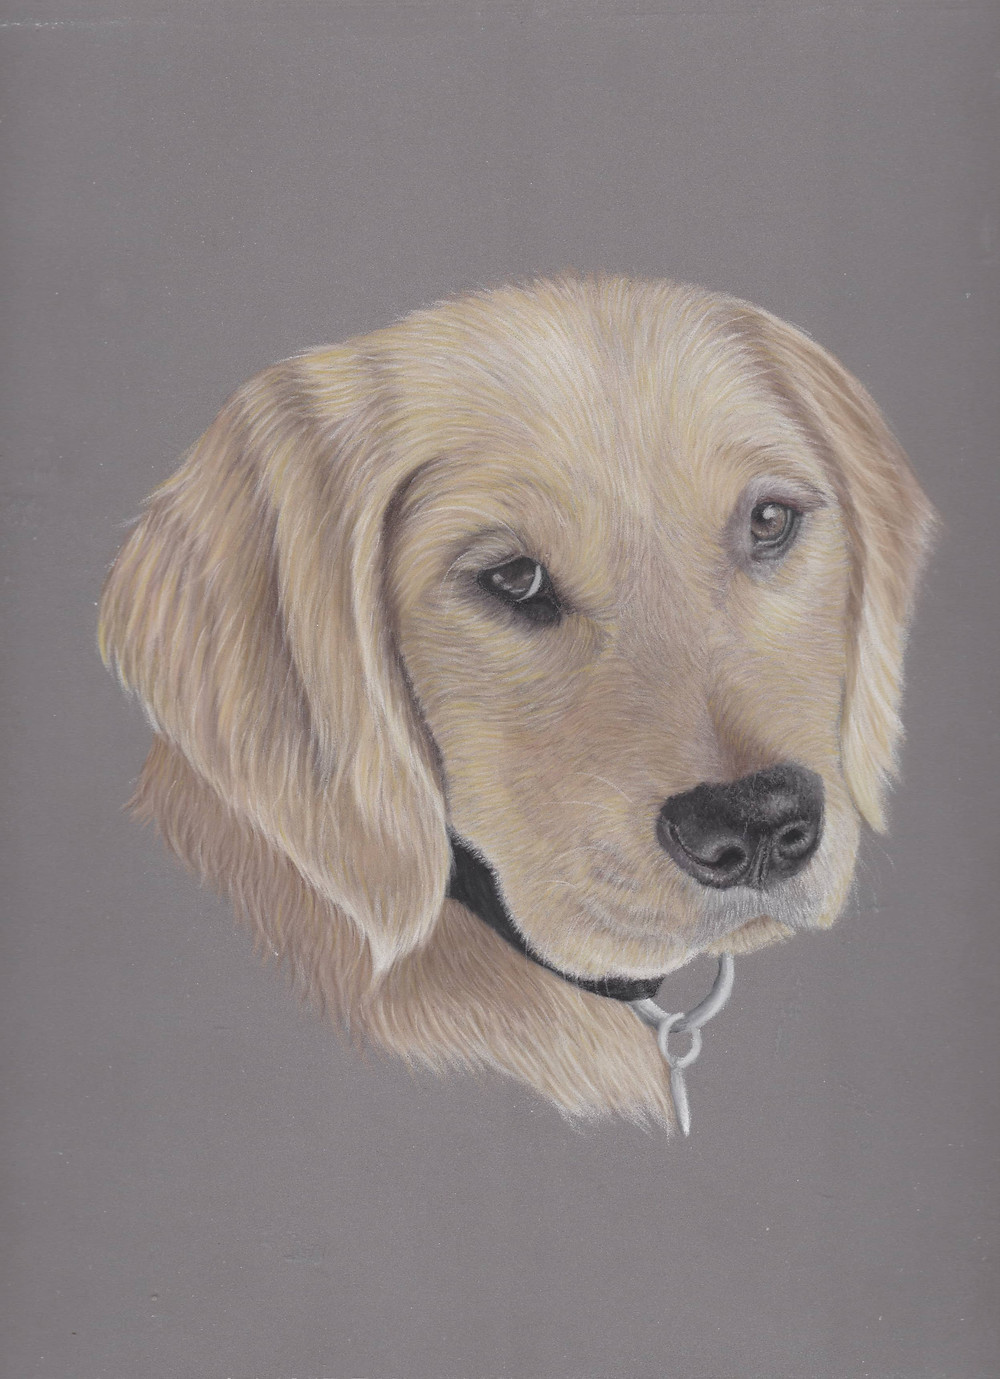 A pastel pet portrait from photos, of a golden retriever dog in a realistic style. It has golden fur and a black nose. BY Amy Elizabeth Fine Art | Pet Portrait Artist Derbyshire